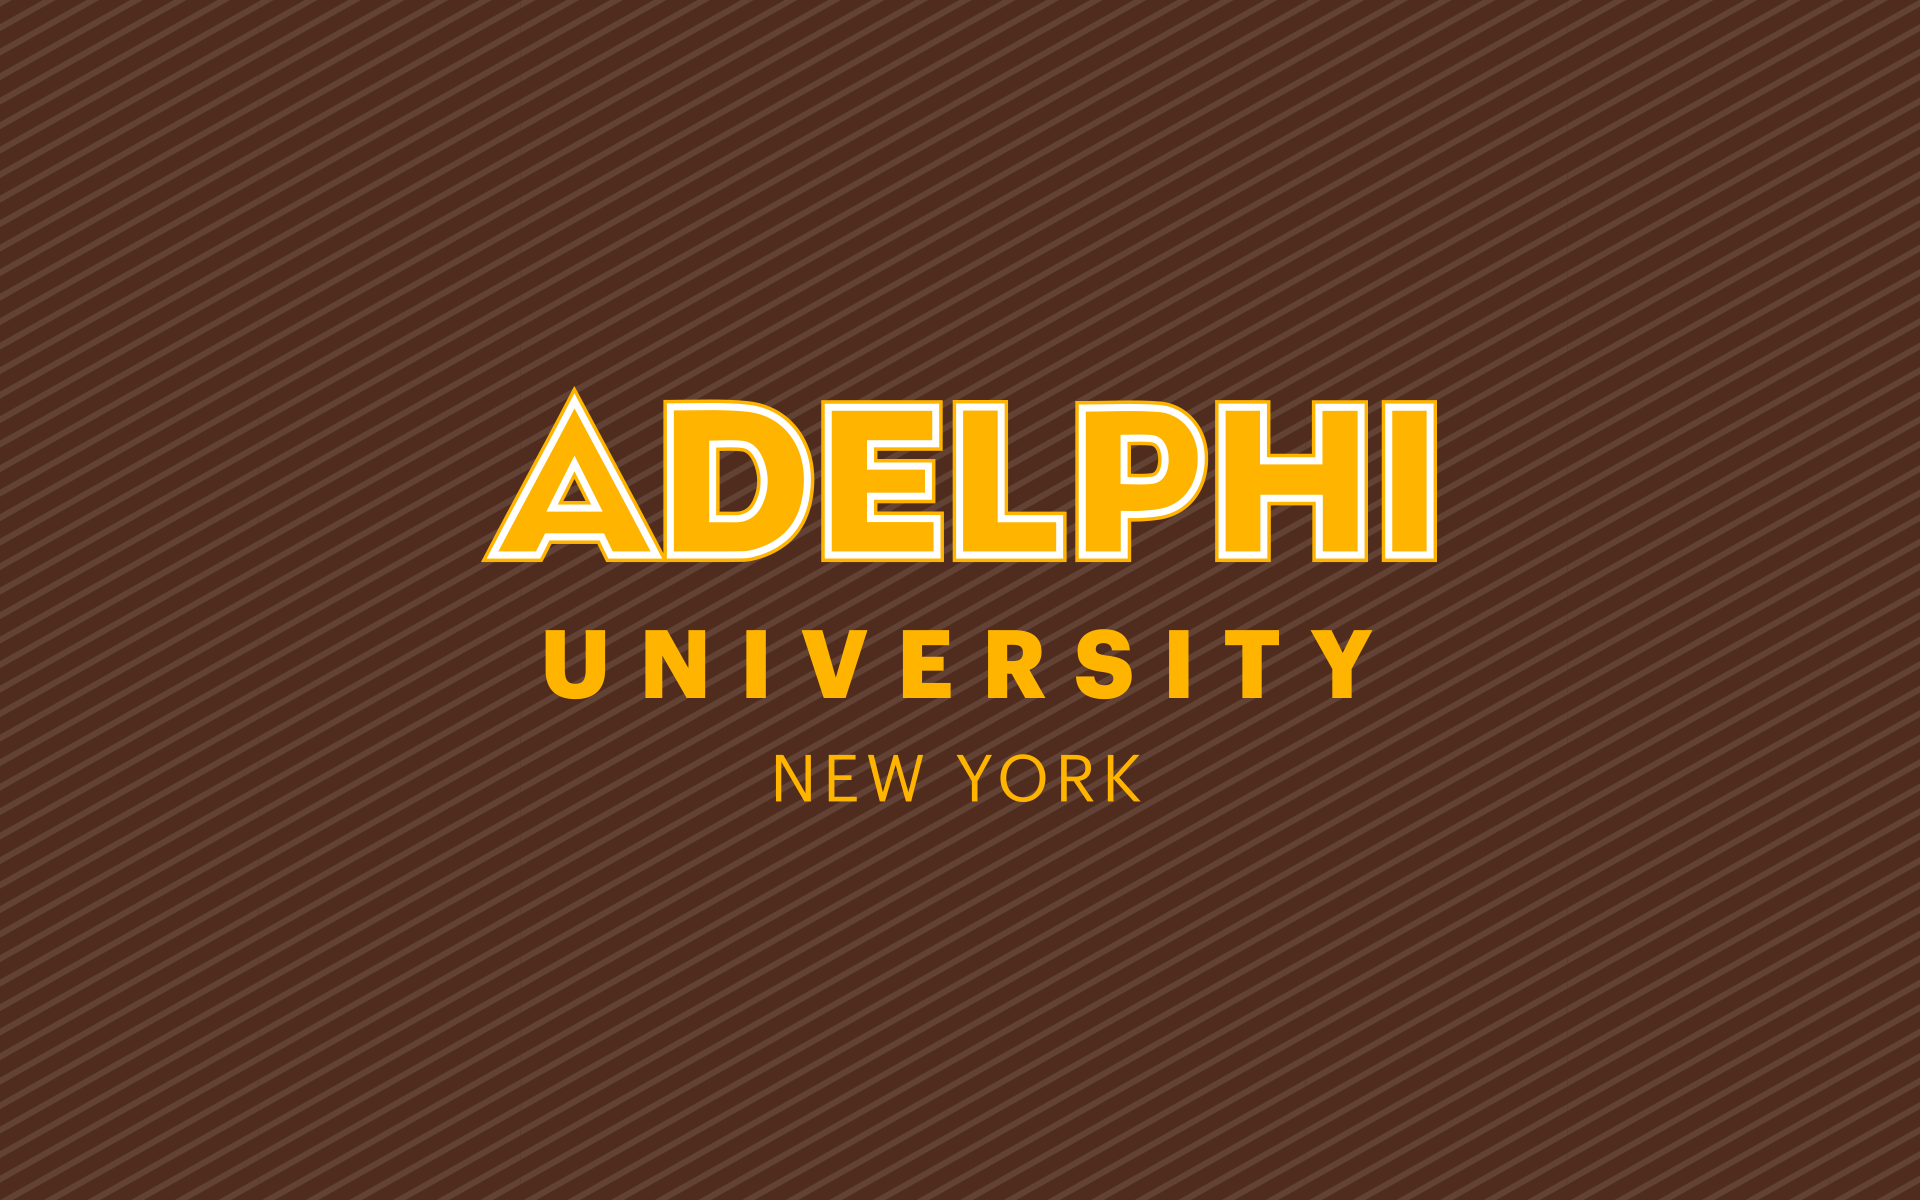 Desktop 16x10 - Adelphi Brown Wallpaper